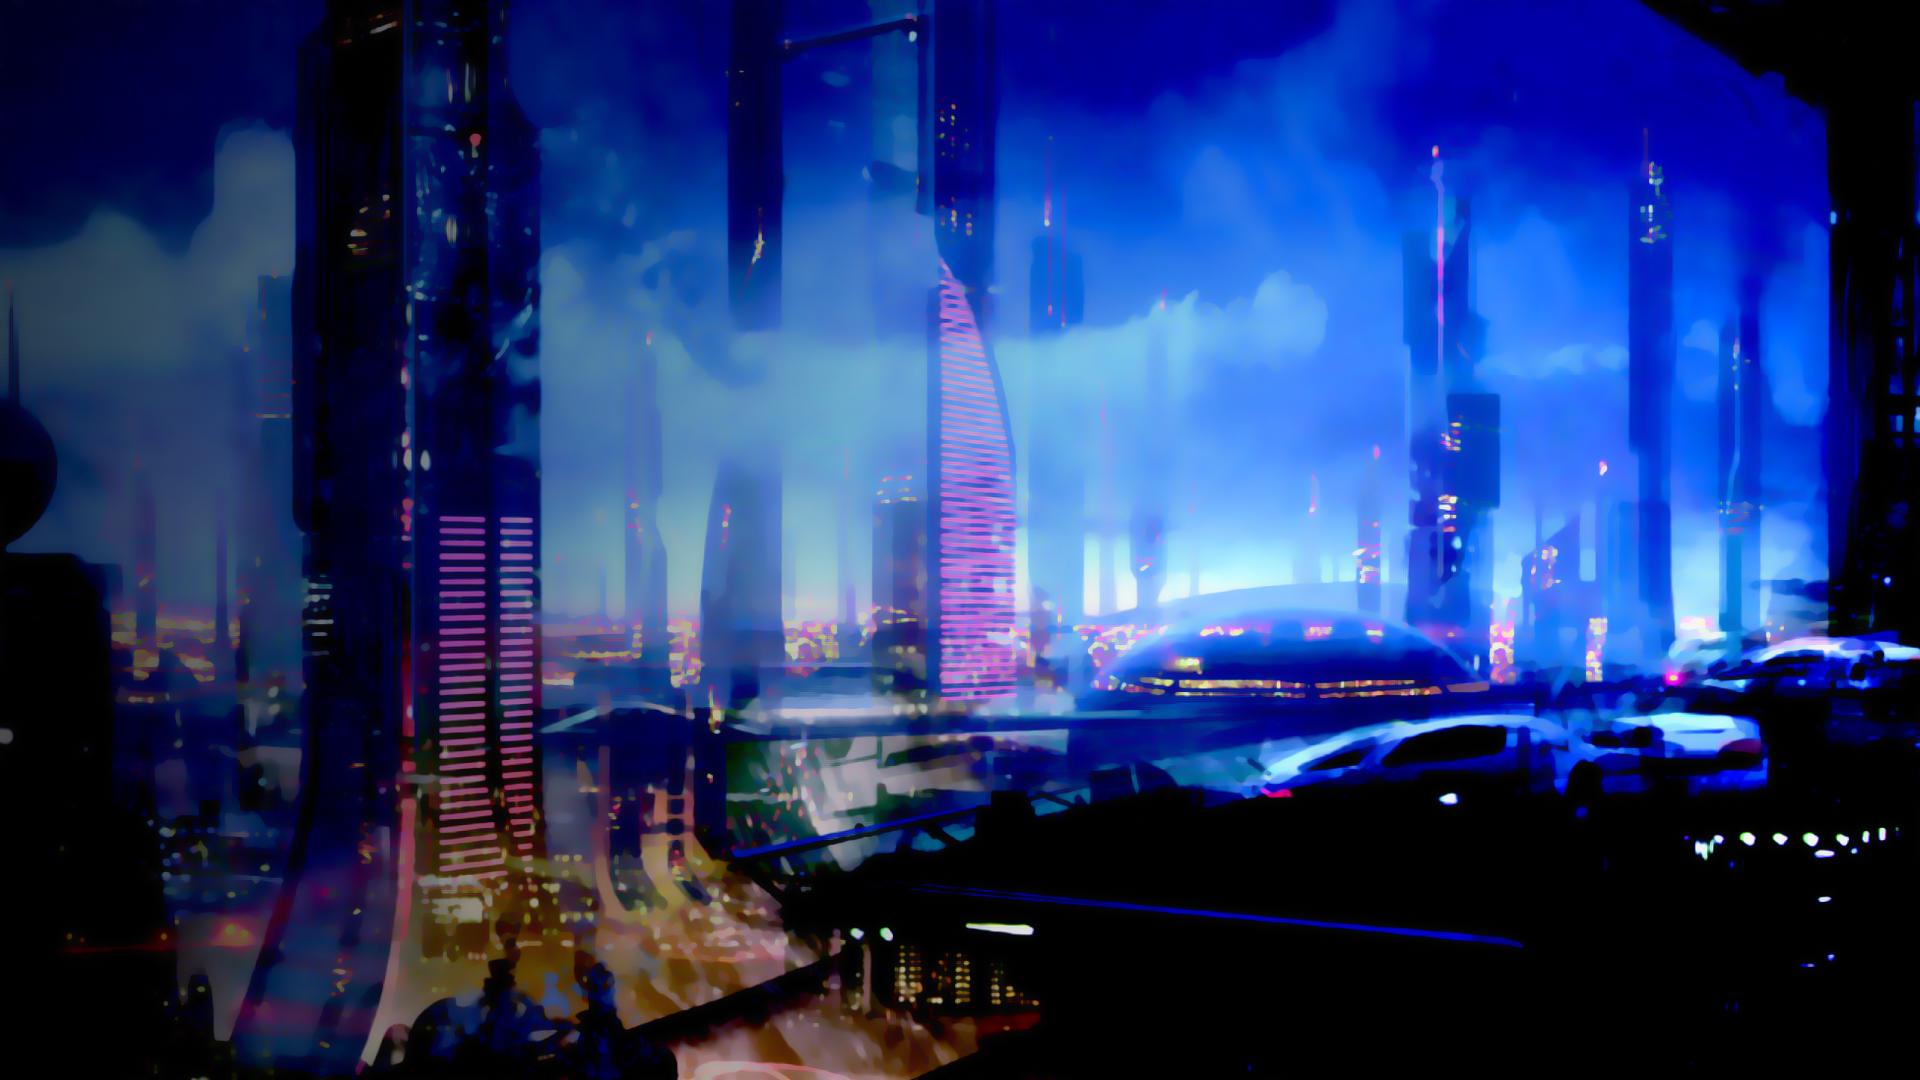 Mass Effect - Ilium by hososoki